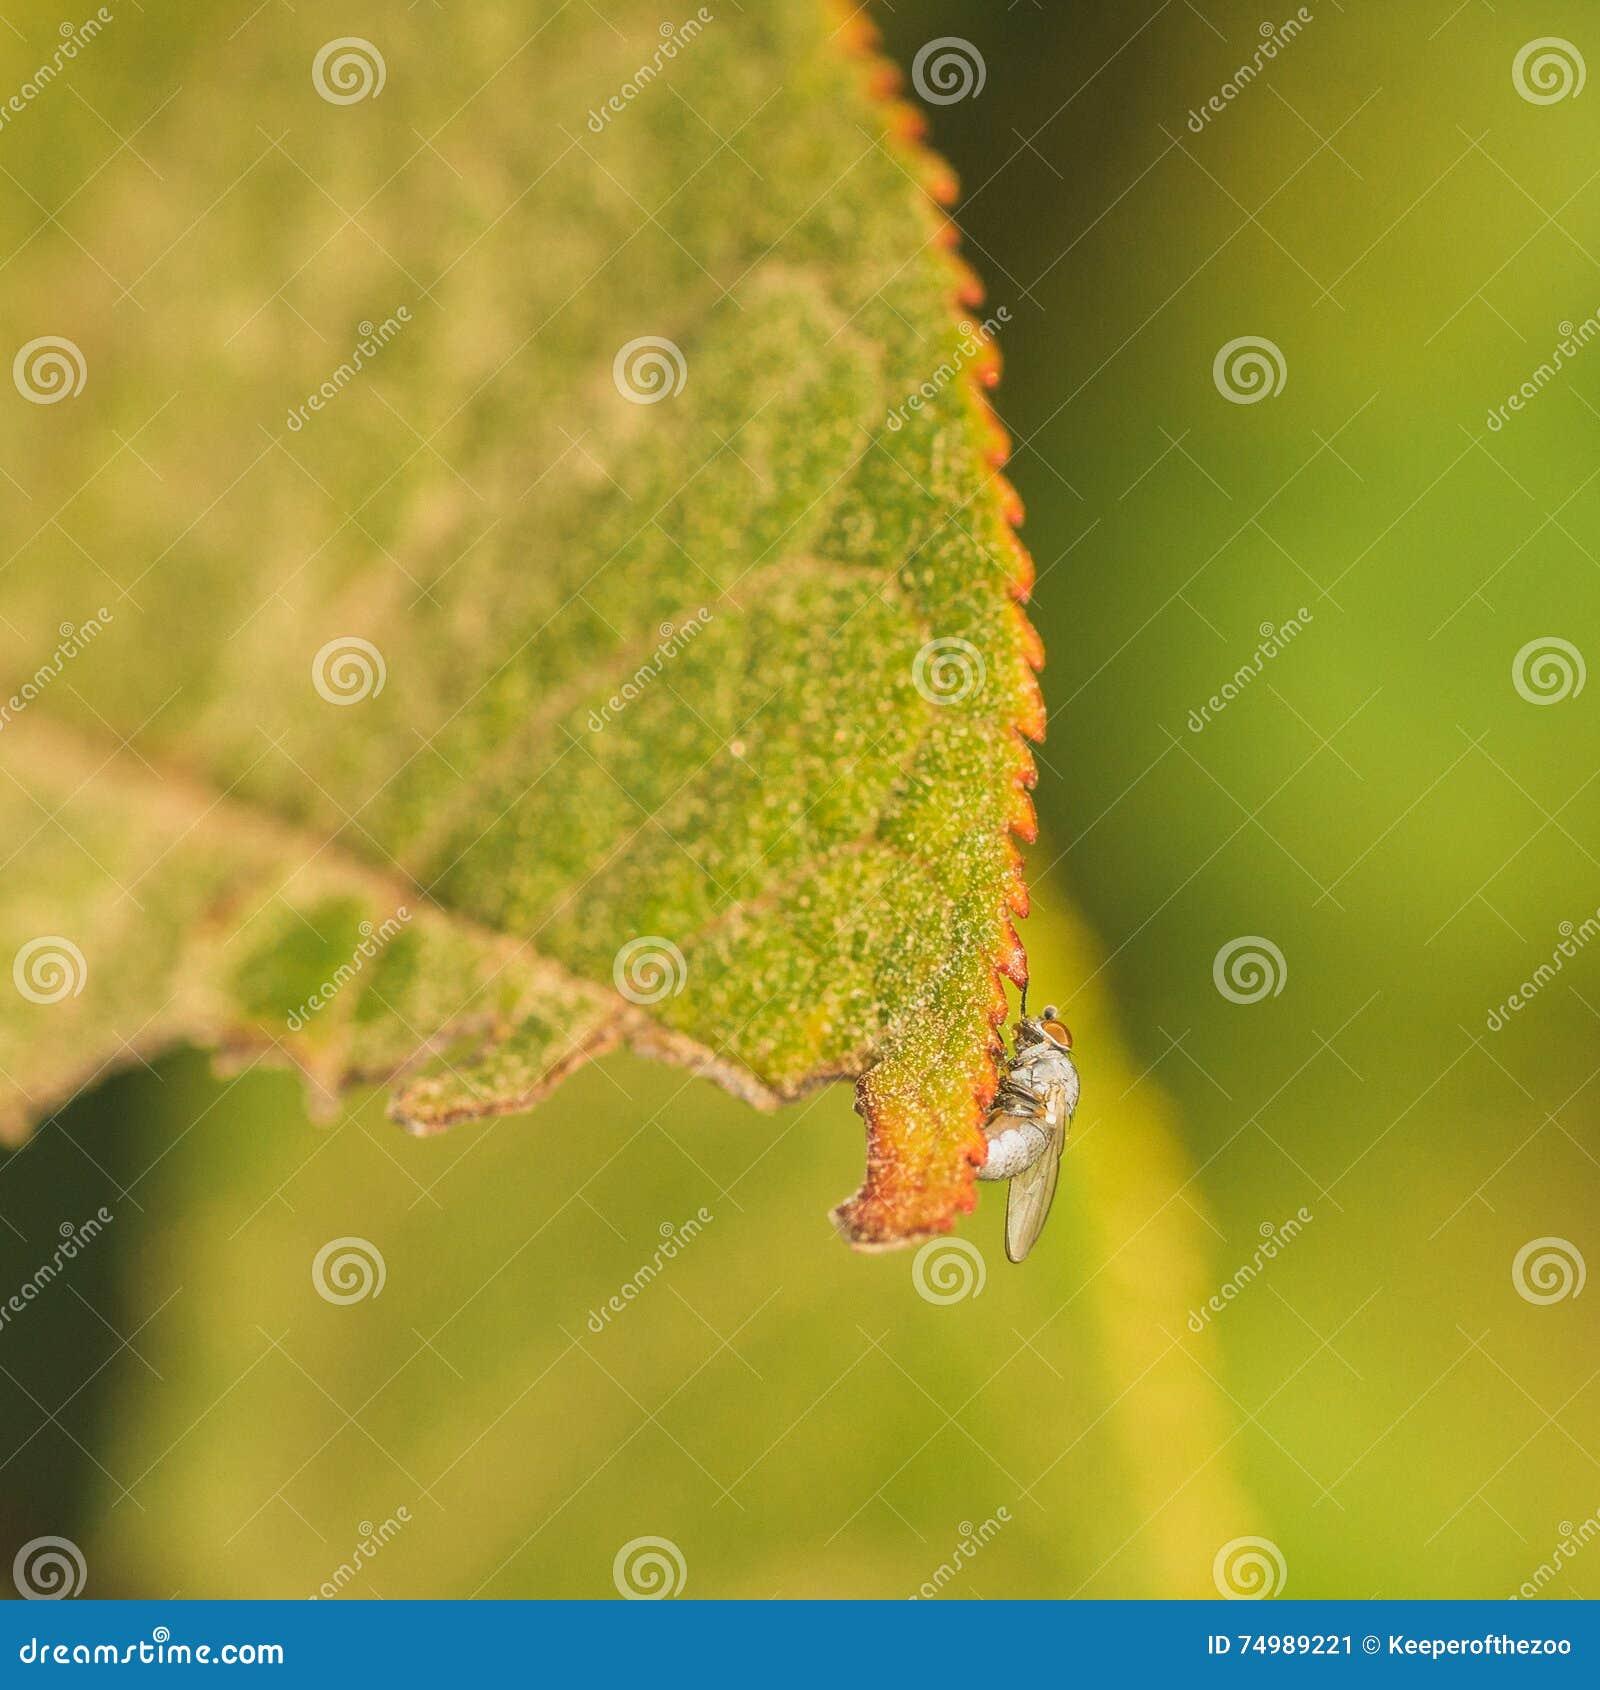 Light Grey Fly on Leaf Edge